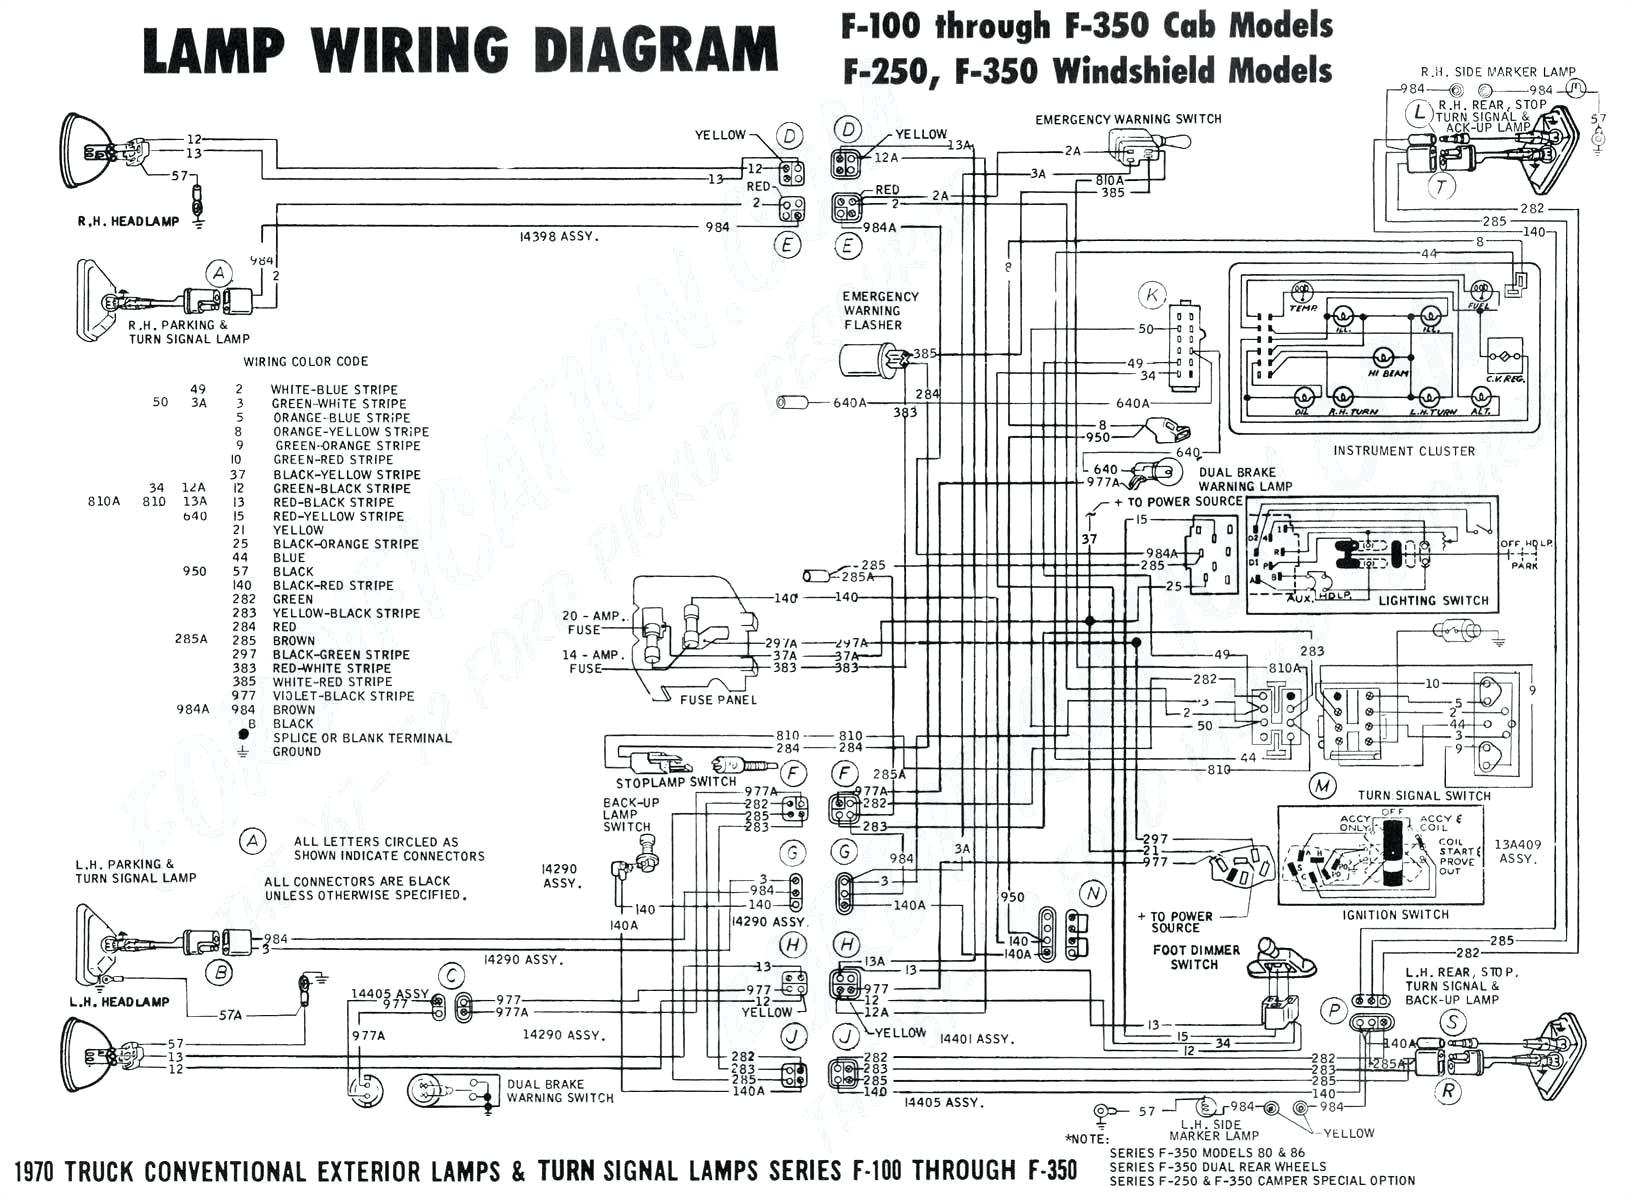 [DIAGRAM_4FR]  DIAGRAM] Vrcd400 Sdu Wiring Diagram FULL Version HD Quality Wiring Diagram  - 223043.VINCENTESCRIVE.FR | Vrcd400 Sdu Wiring Diagram |  | vincentescrive.fr